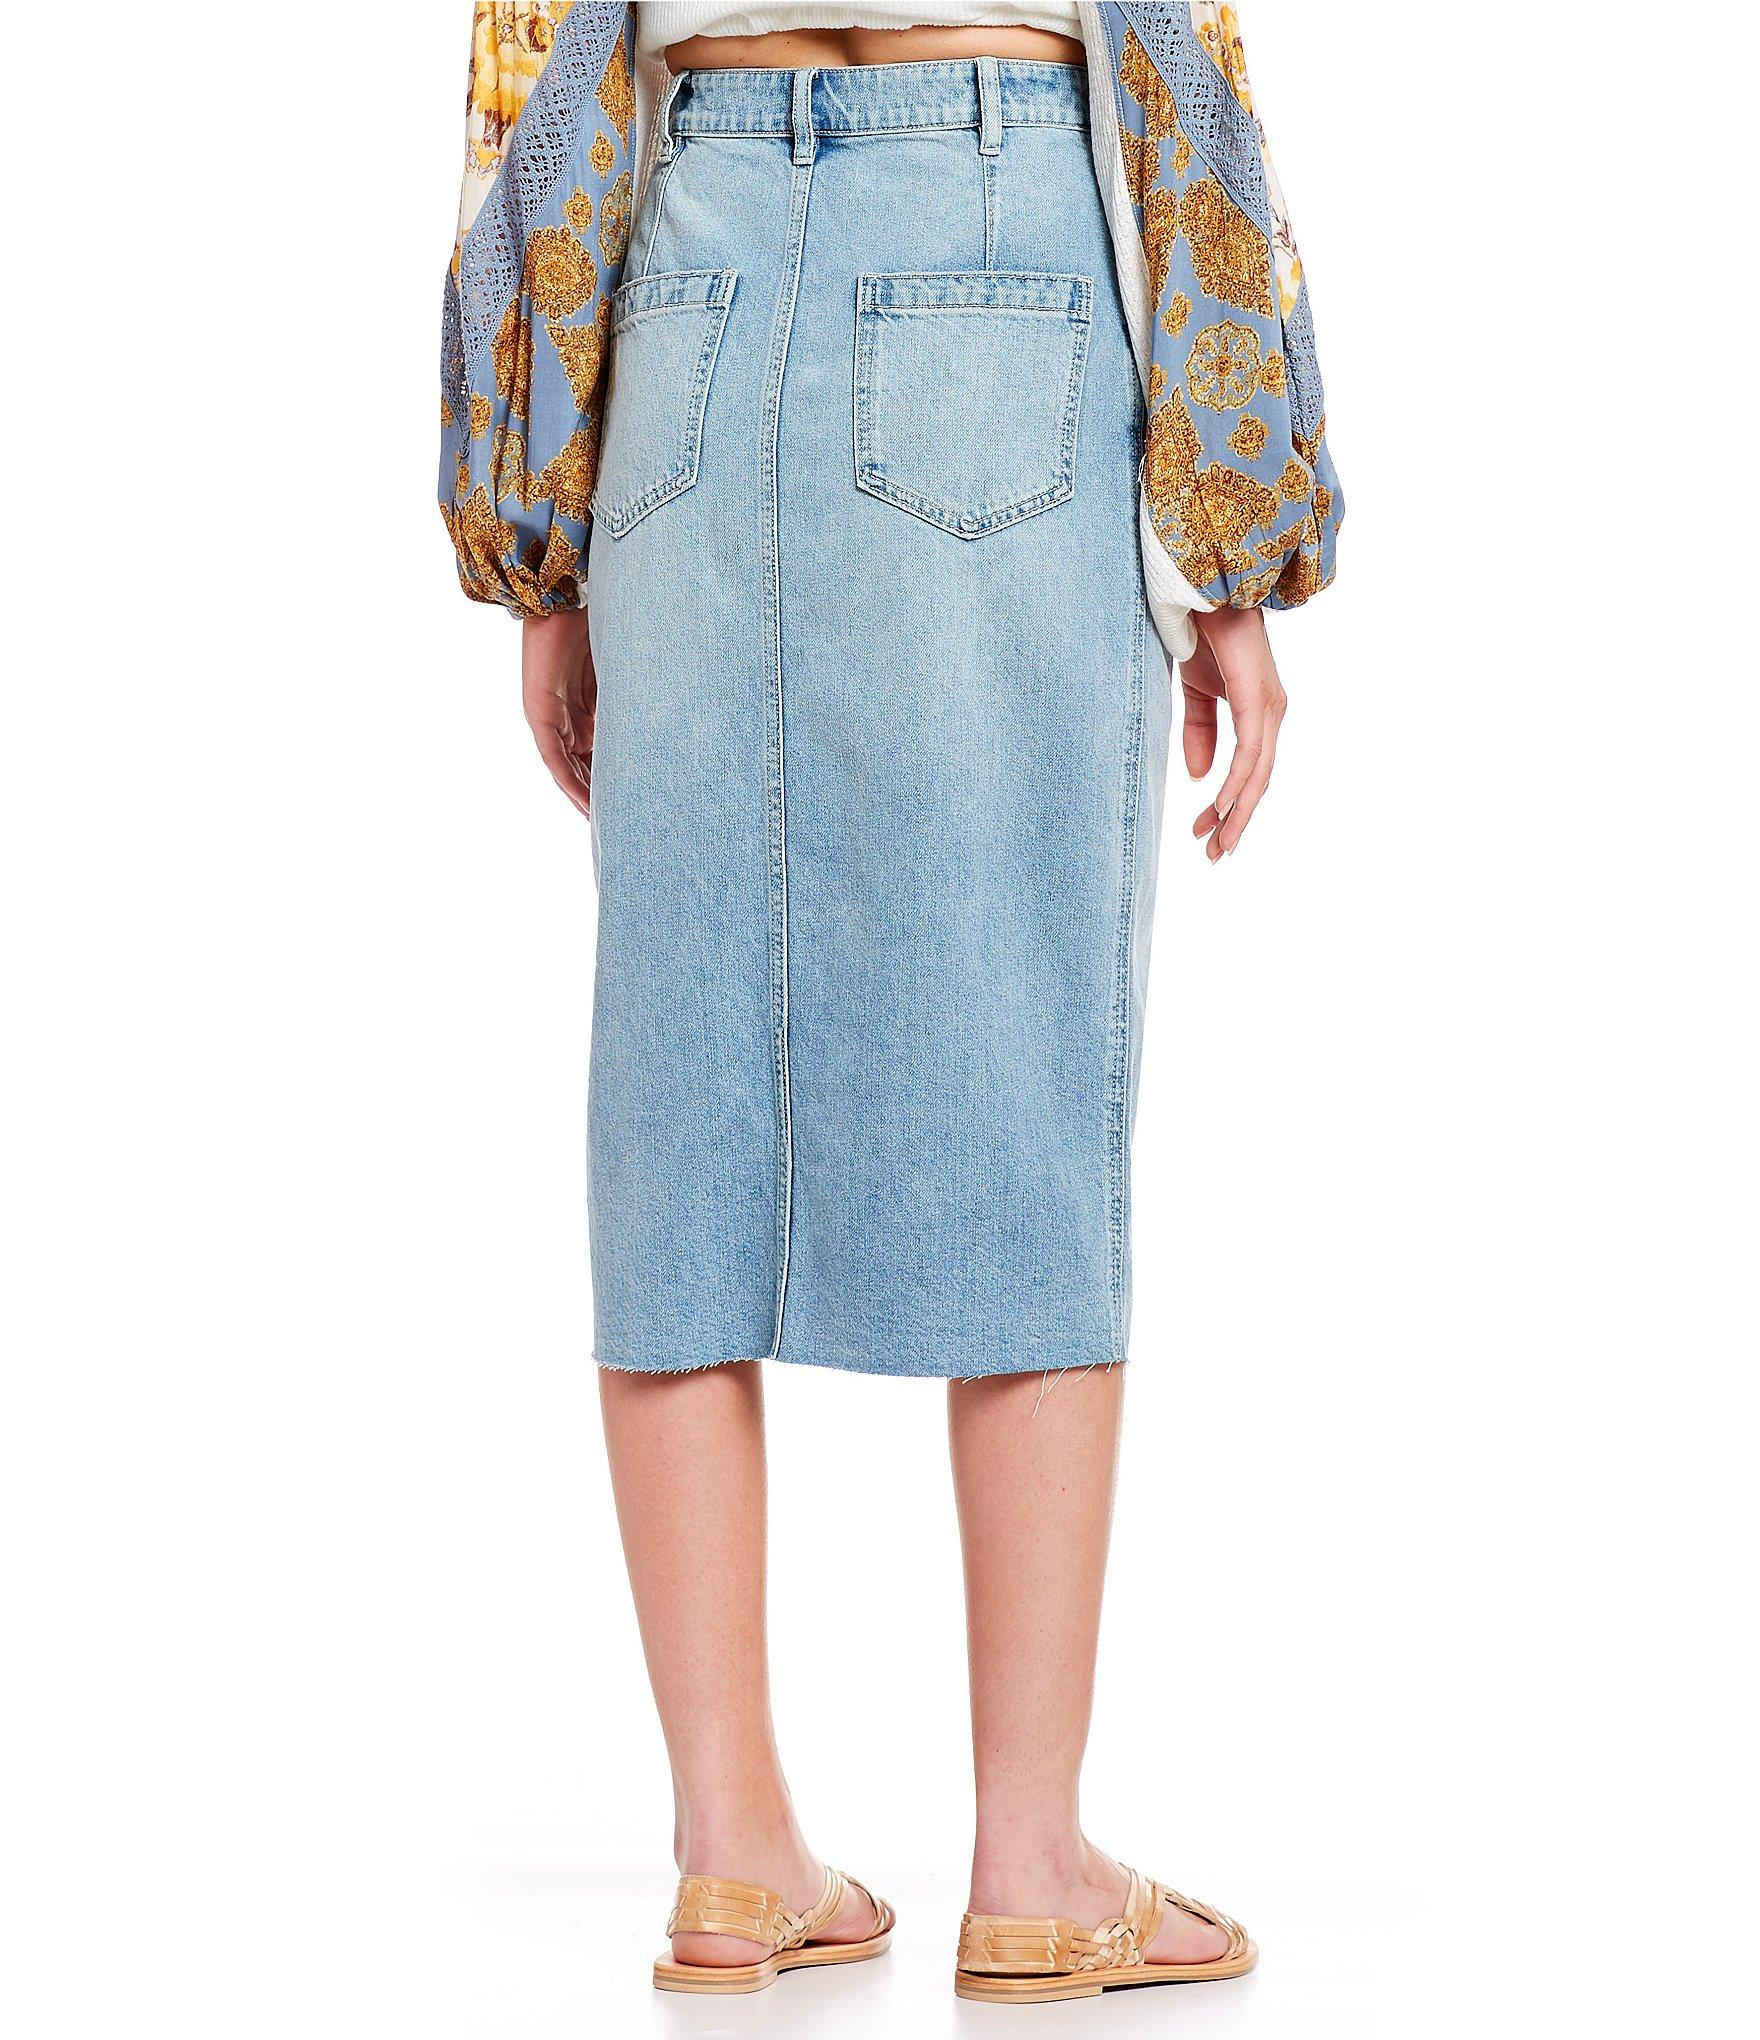 fc32f8bf75 Free People - Blue Wilshire Denim Body Skimming Skirt - Lyst. View  fullscreen